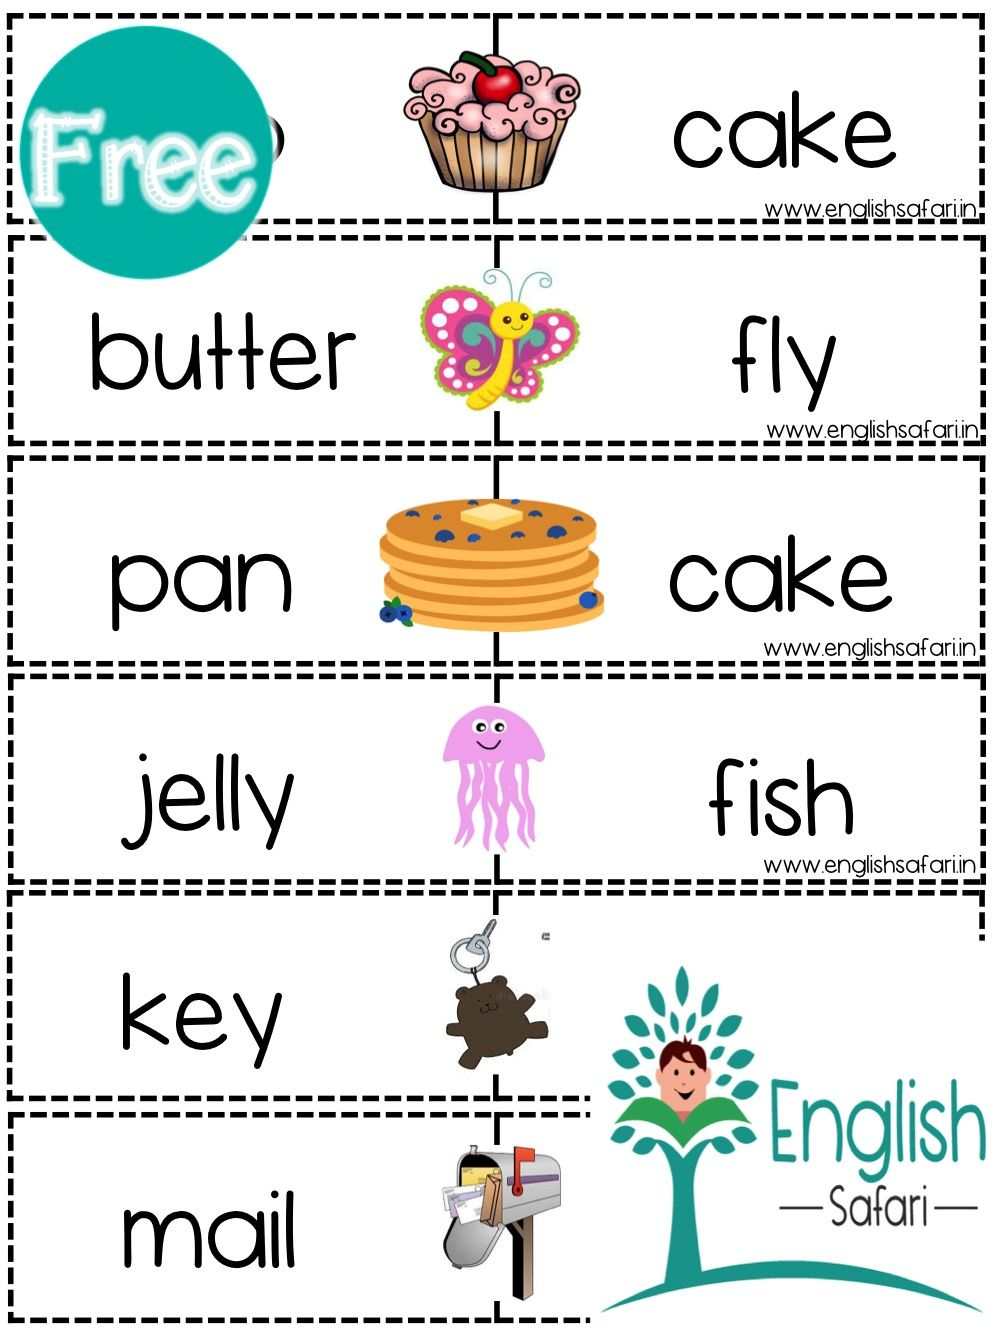 Free Compound Words Puzzles Www Englishsafari In Compound Words Compound Words Worksheets Word Puzzles [ 1333 x 1000 Pixel ]